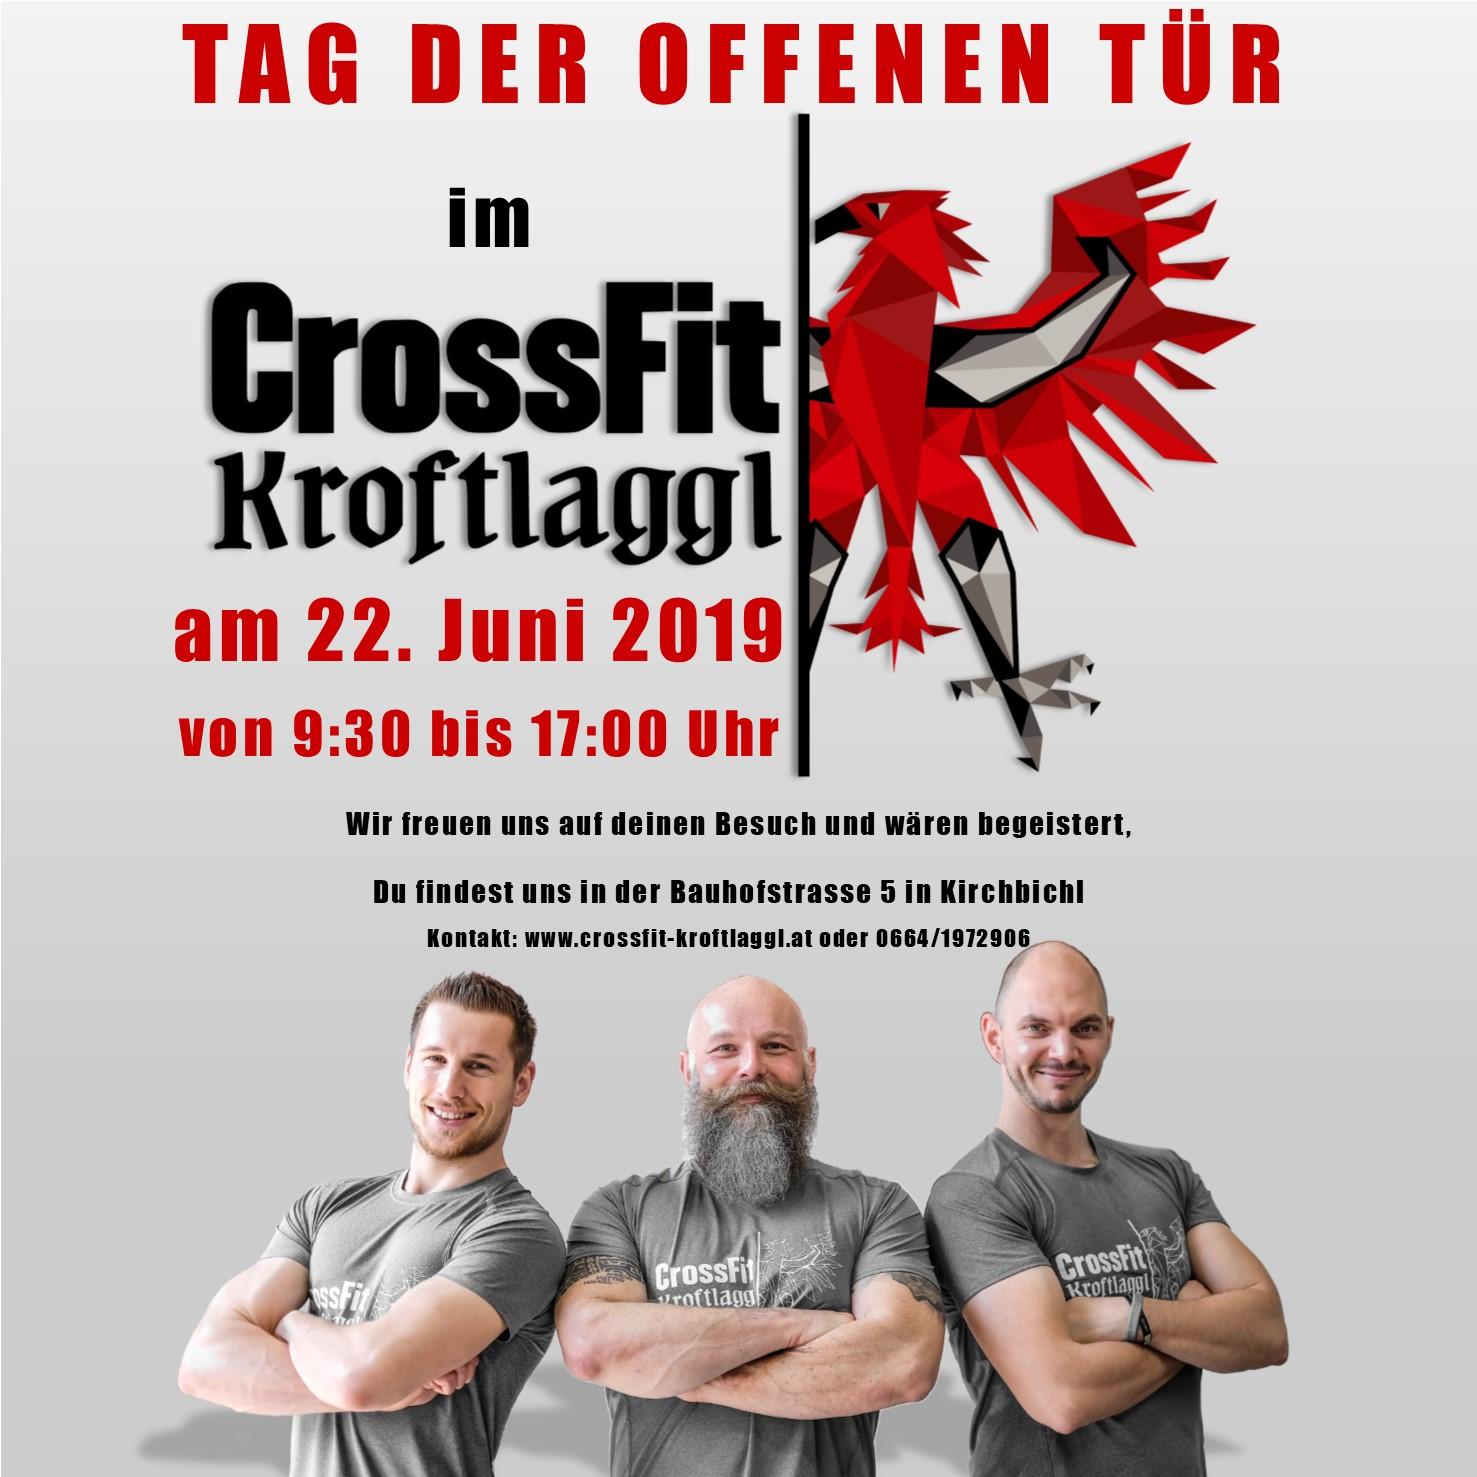 CrossFit Kroftlaggl lädt zum Open Day